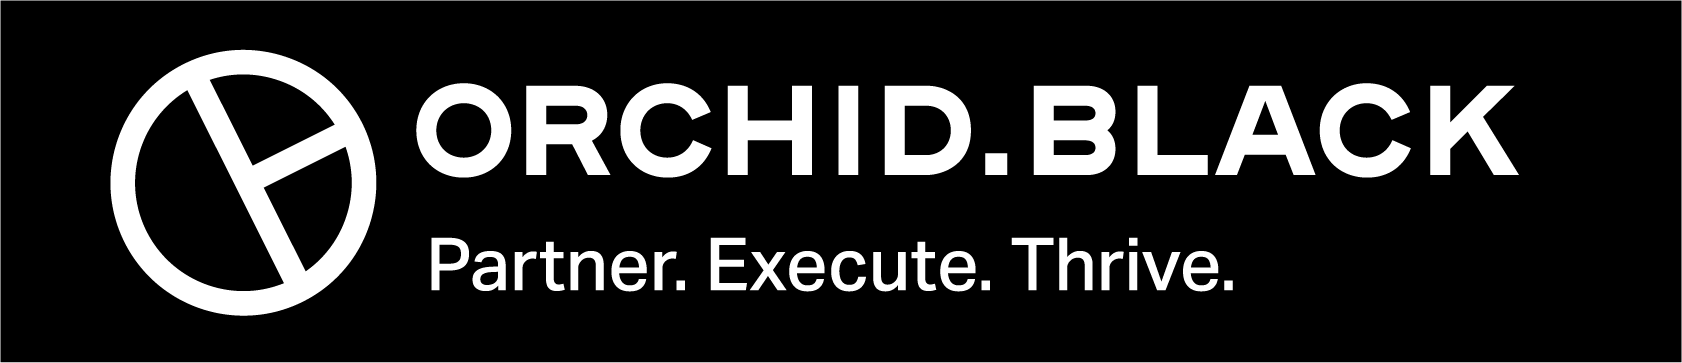 Logo for Orchid Black